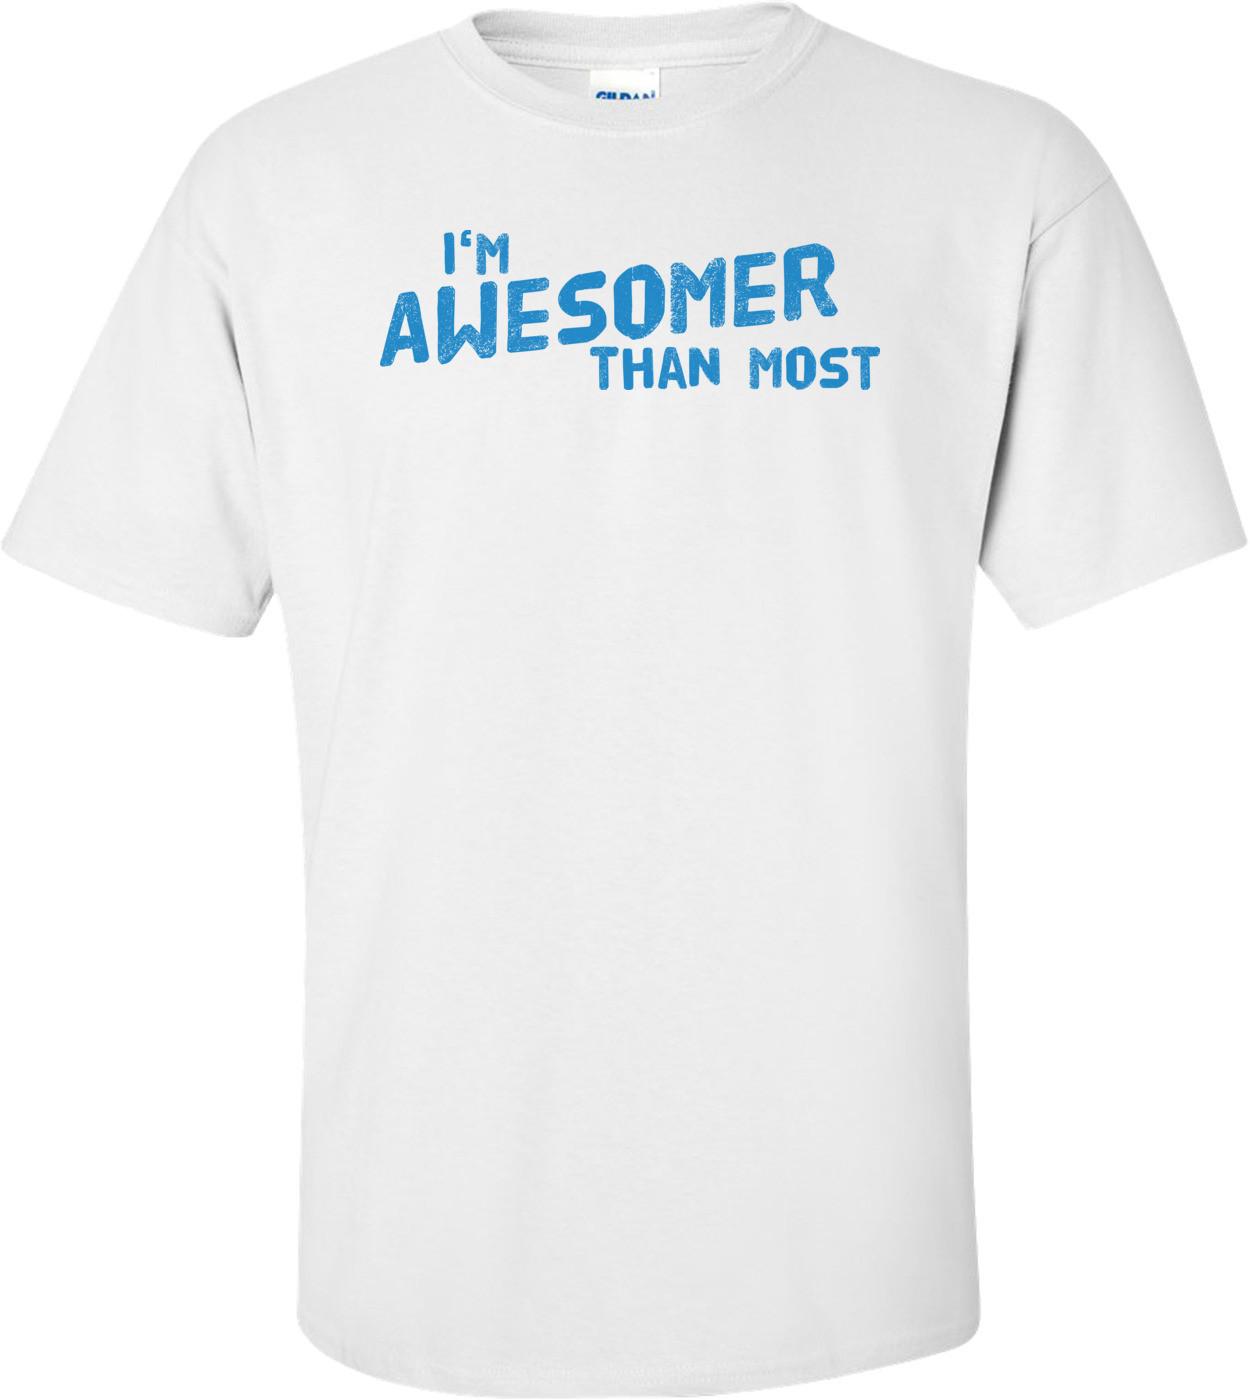 I'm Awesomer Than Most T-shirt